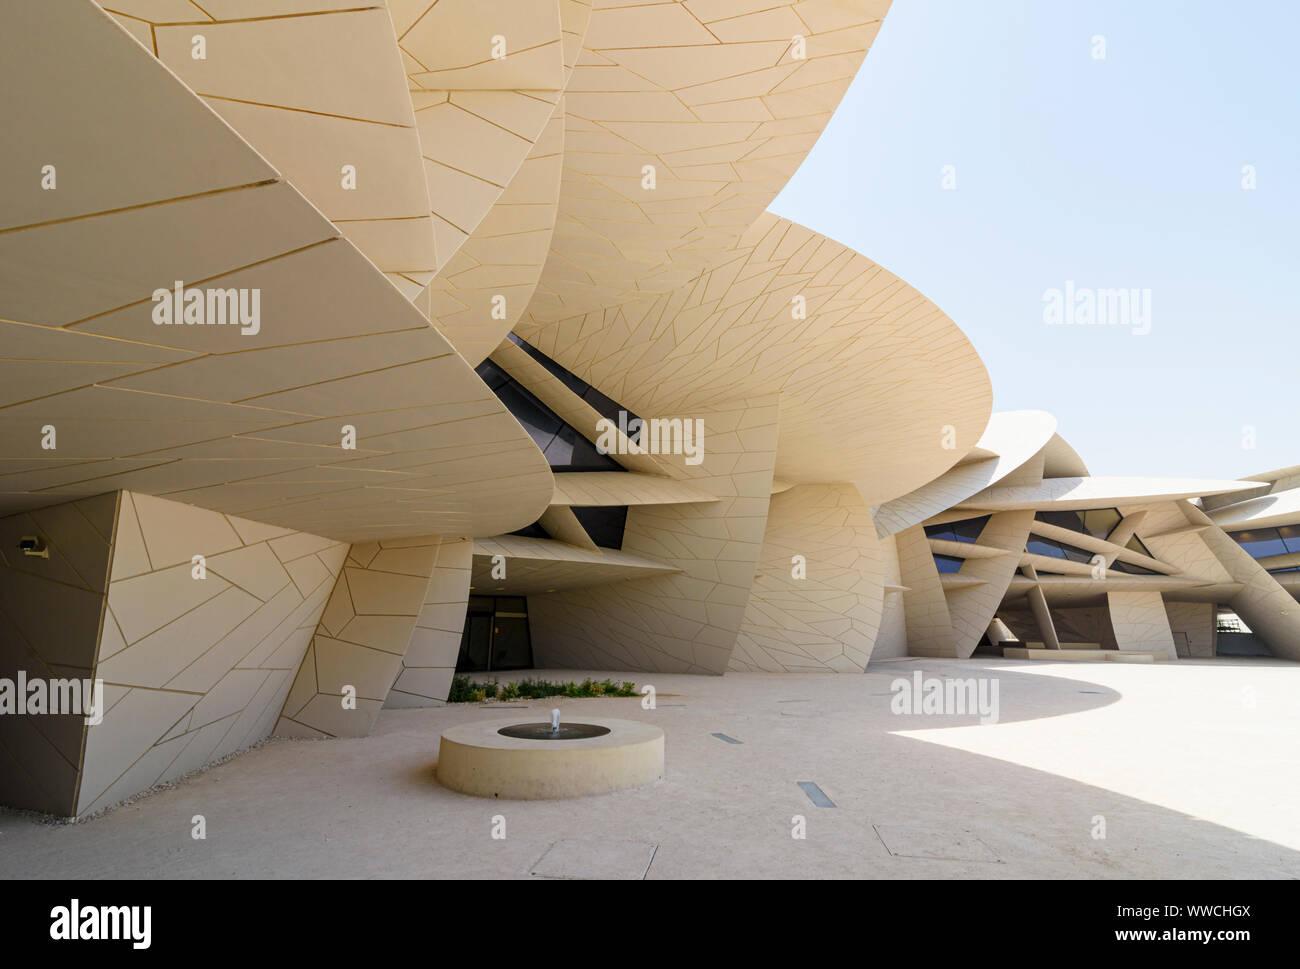 The desert rose inspired architectural landmark of the National Museum of Qatar, Doha, Qatar Stock Photo